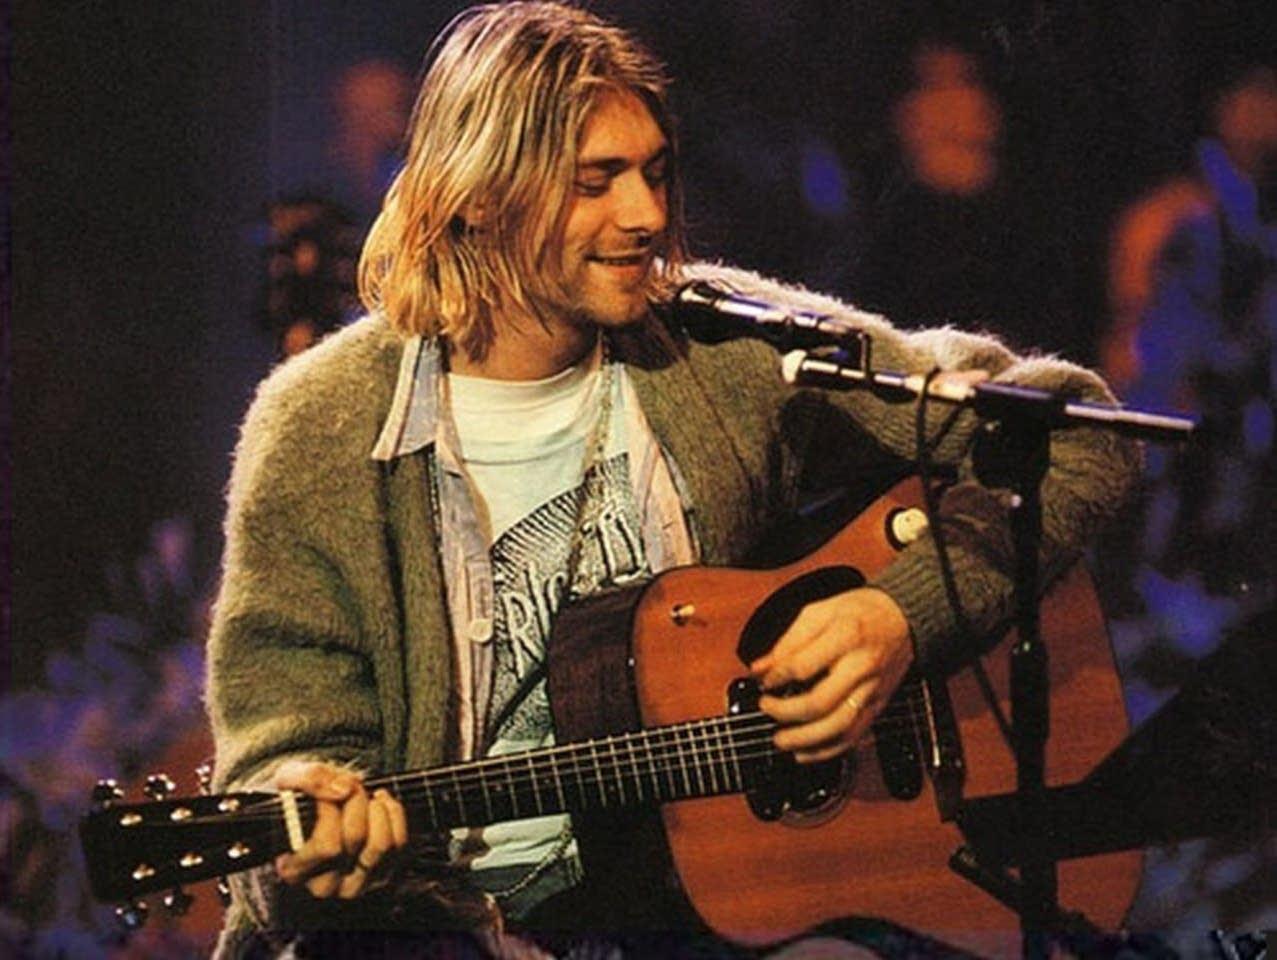 kurt cobain heavy cardigan unplugged